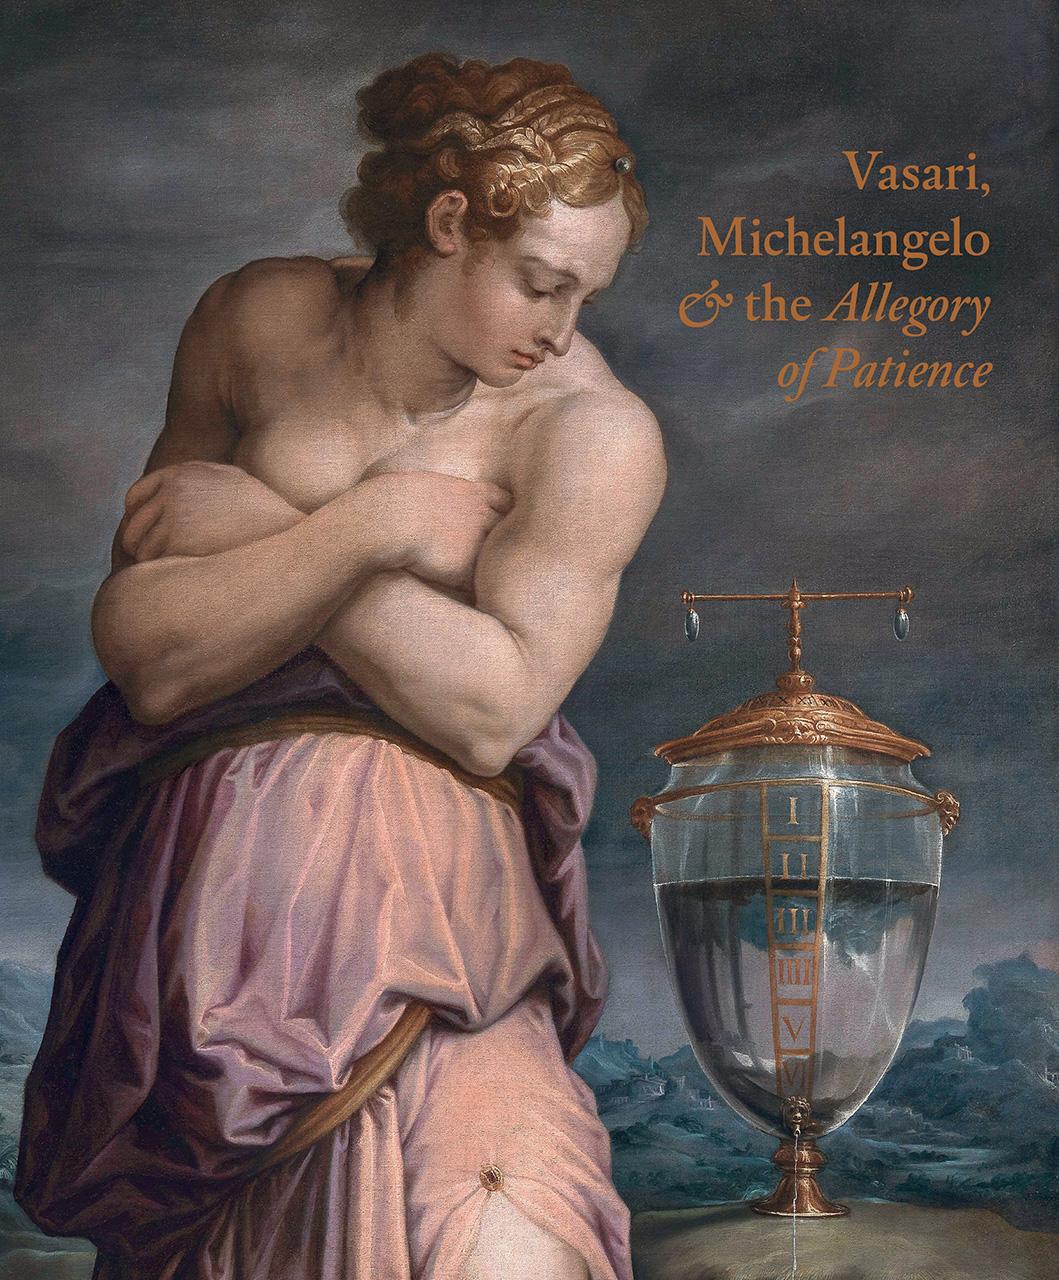 Vasari, Michelangelo and the Allegory of Patience